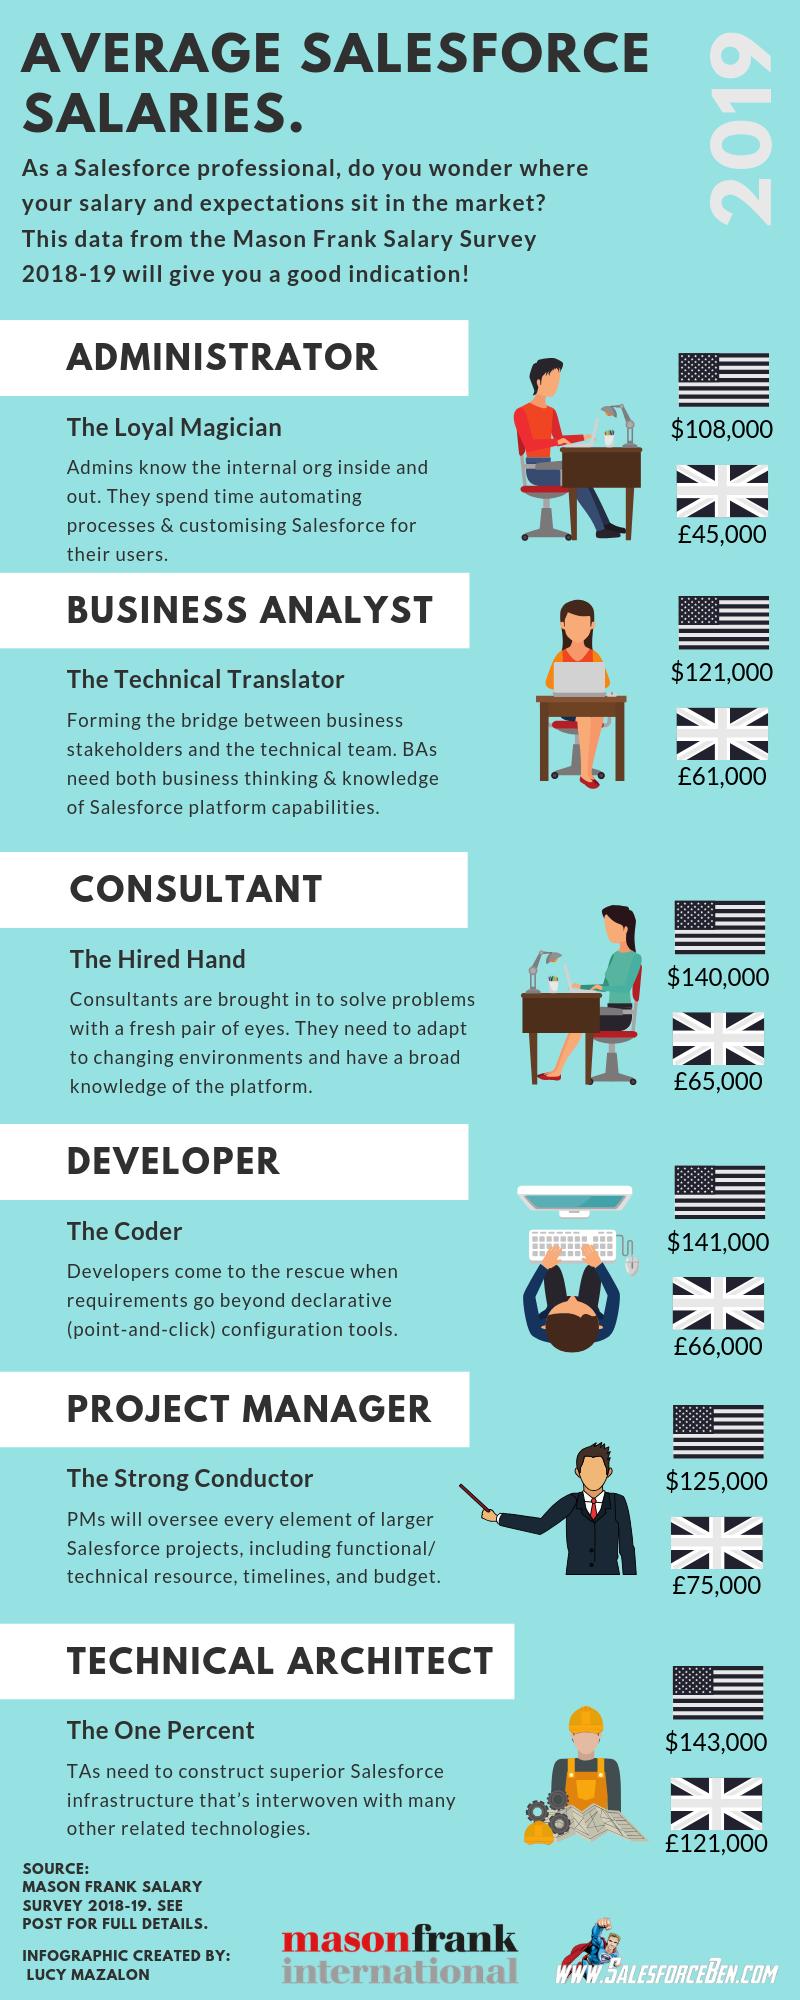 Average Salesforce Salaries 2019 [Infographic] - Salesforce Ben